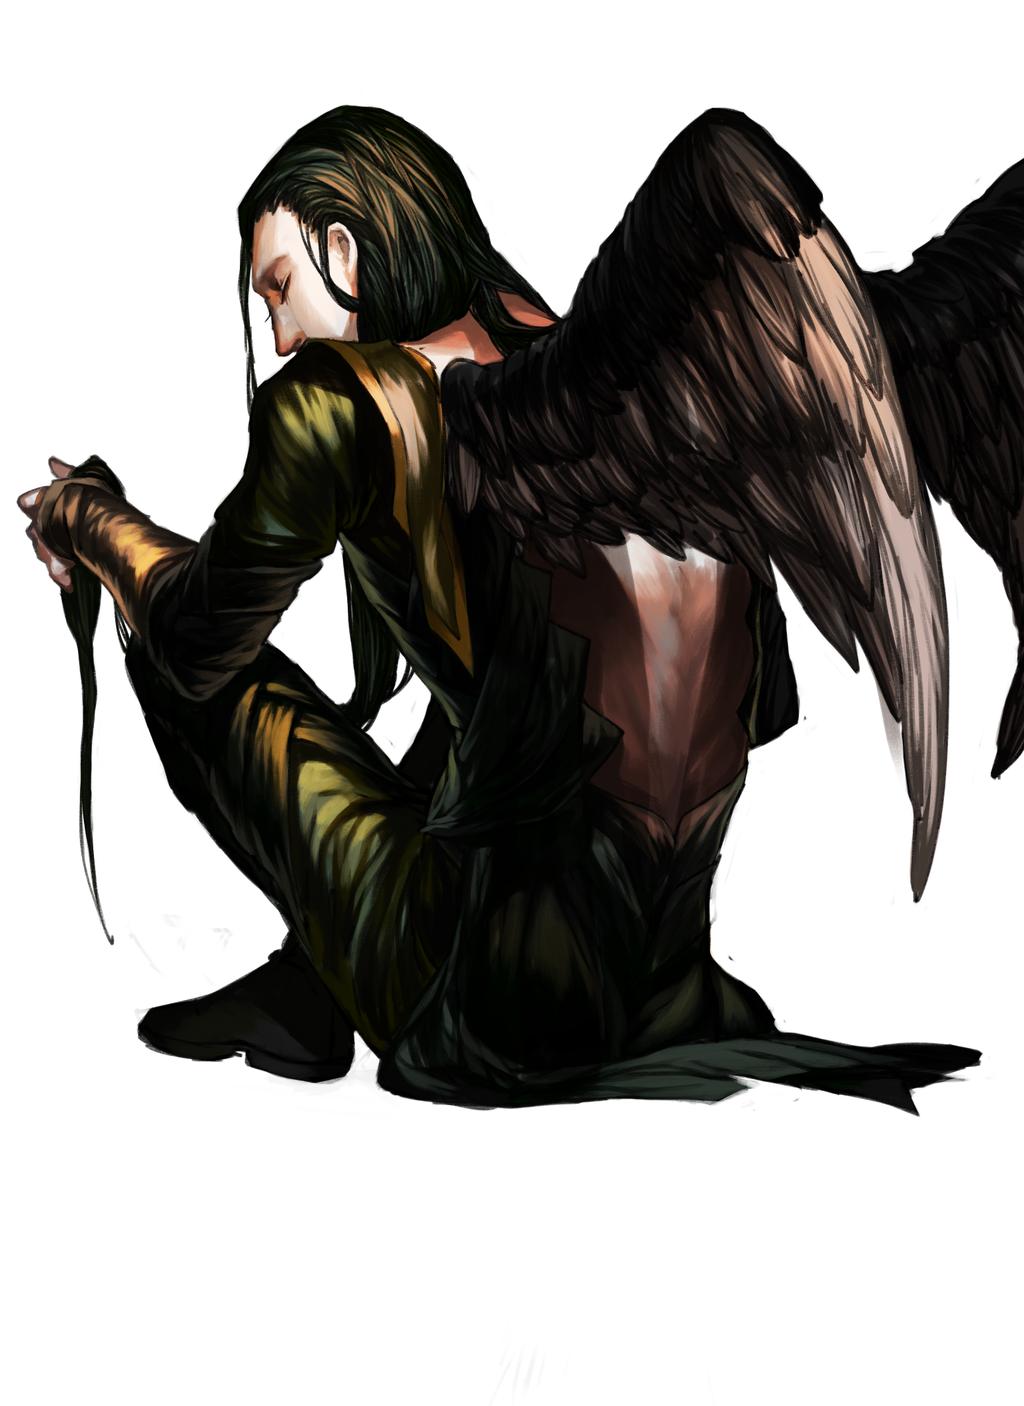 I am having a hard time deciding if I want to write Winged